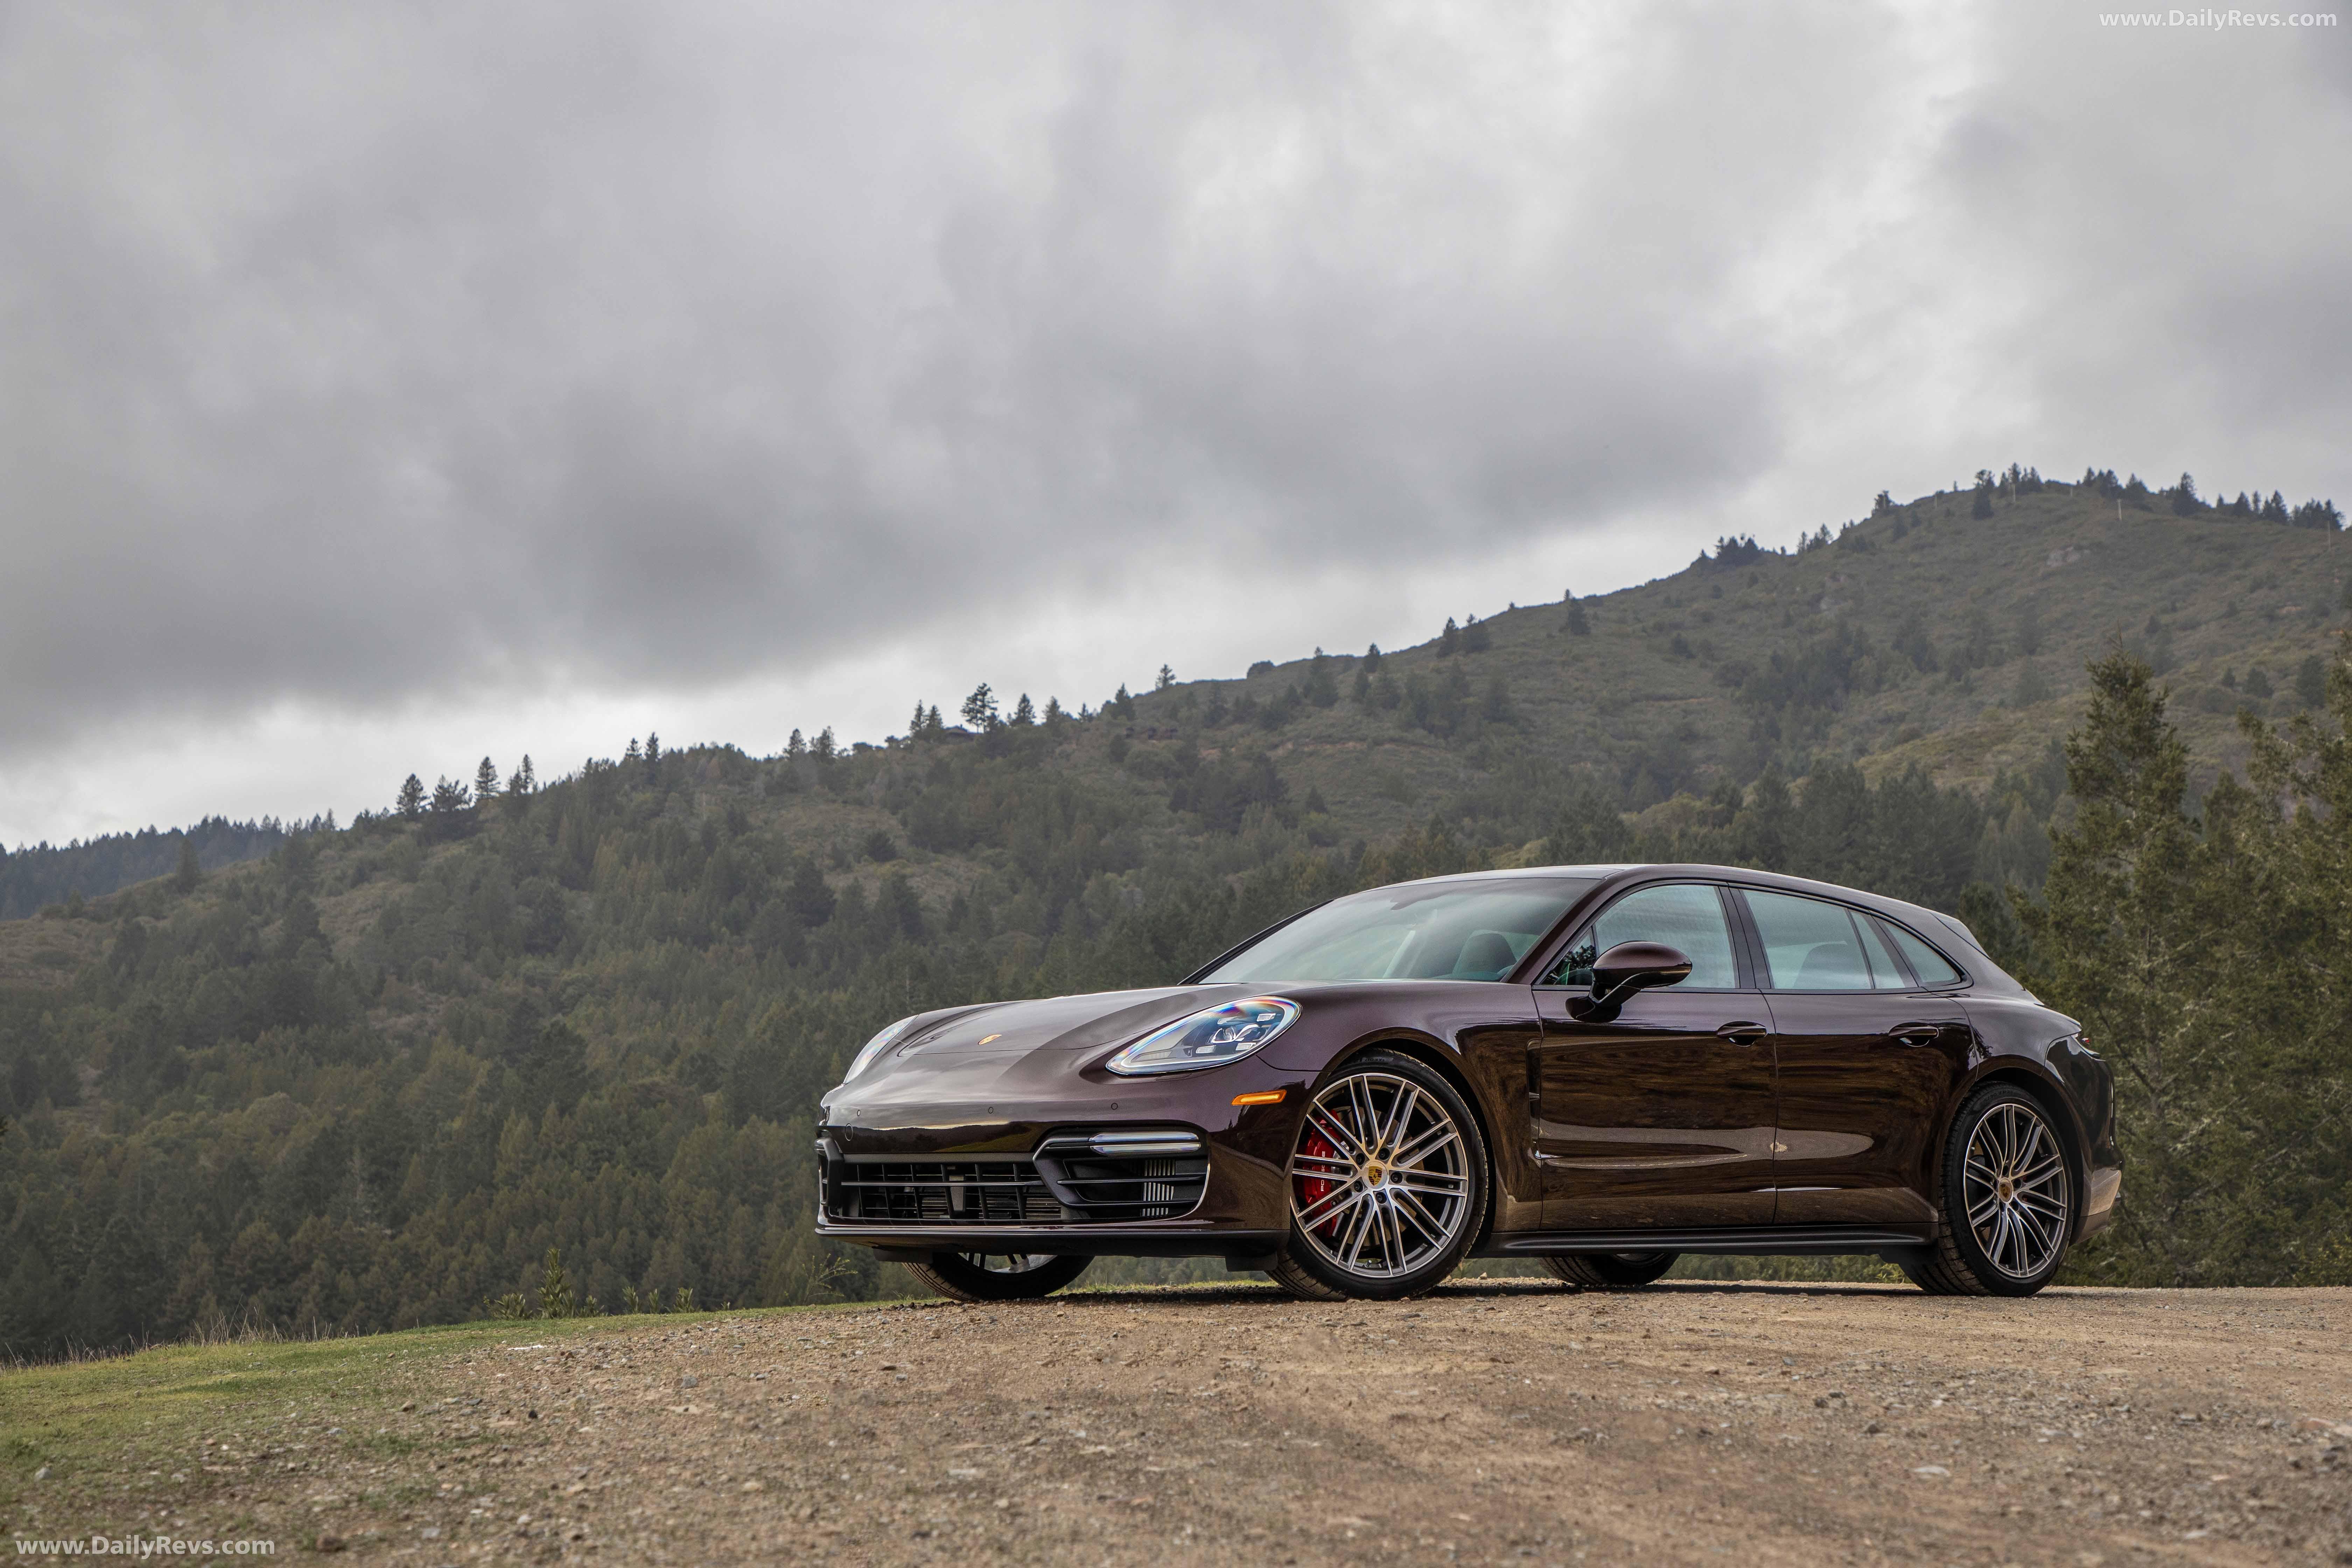 2019 Porsche Panamera GTS Sport Turismo - HD Pictures ...